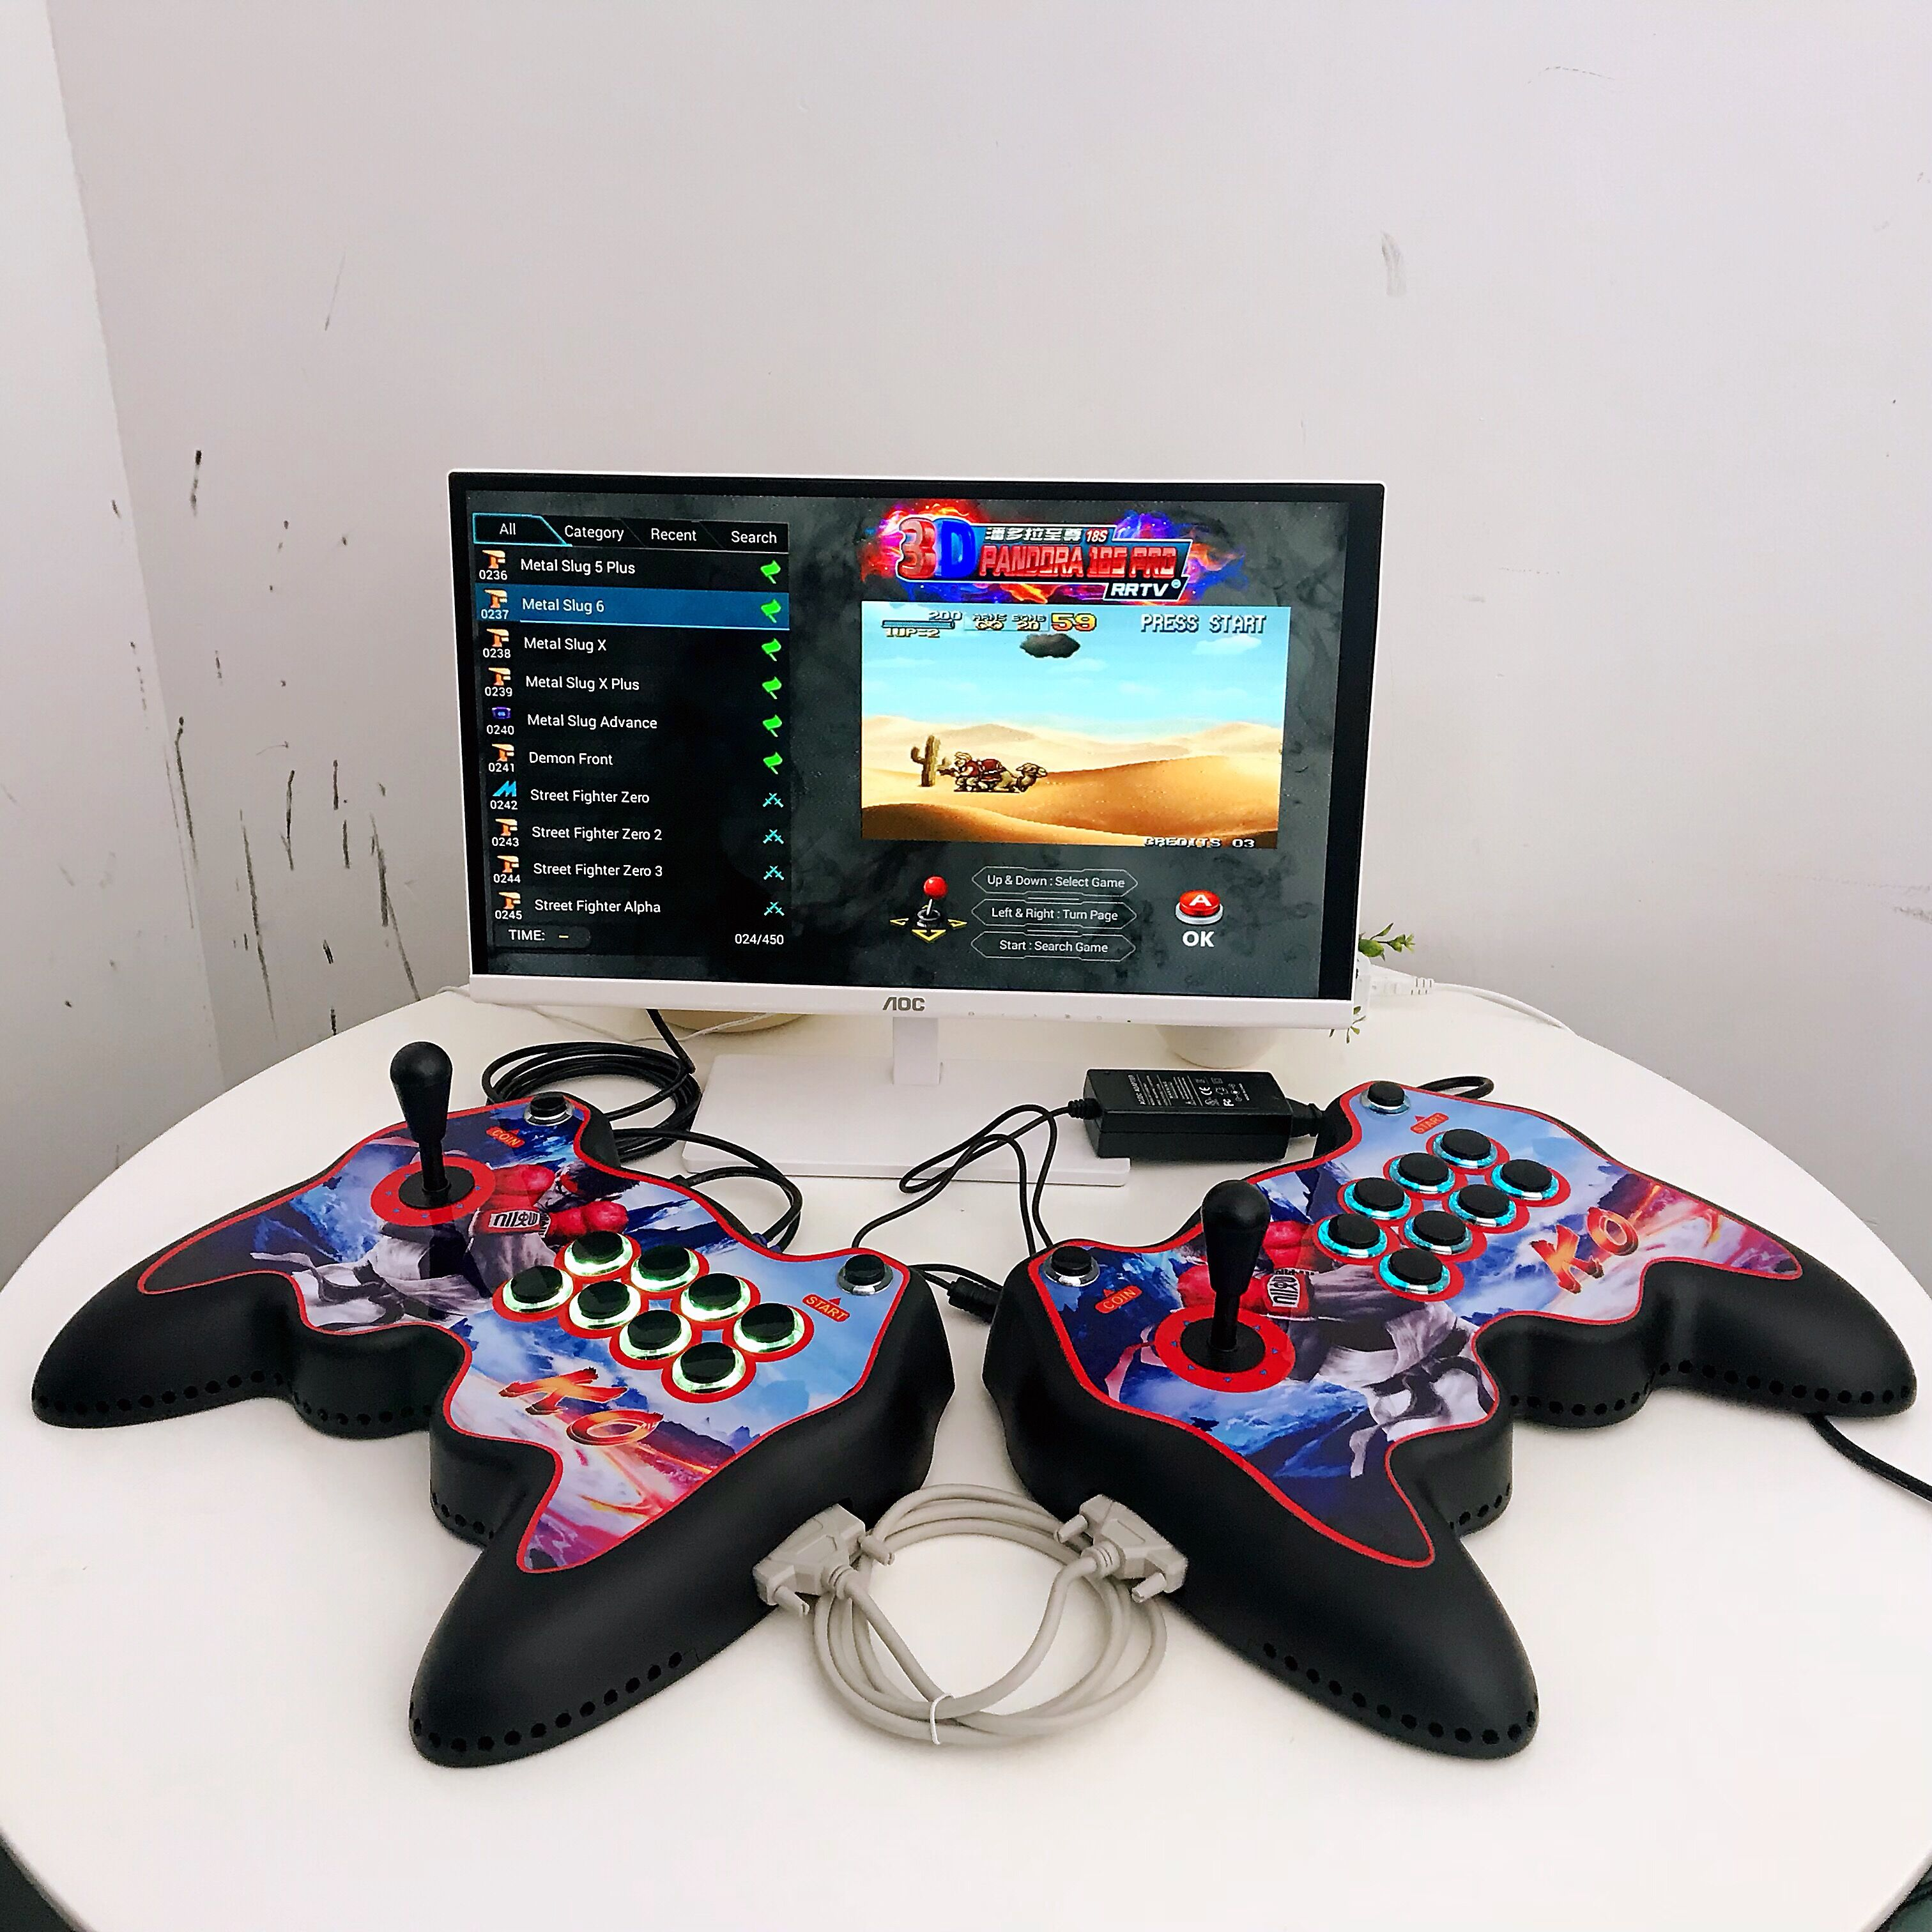 NEW Joystick Shaped Pandora Box 18S Pro 4500 Games Console Machine WiFi Version